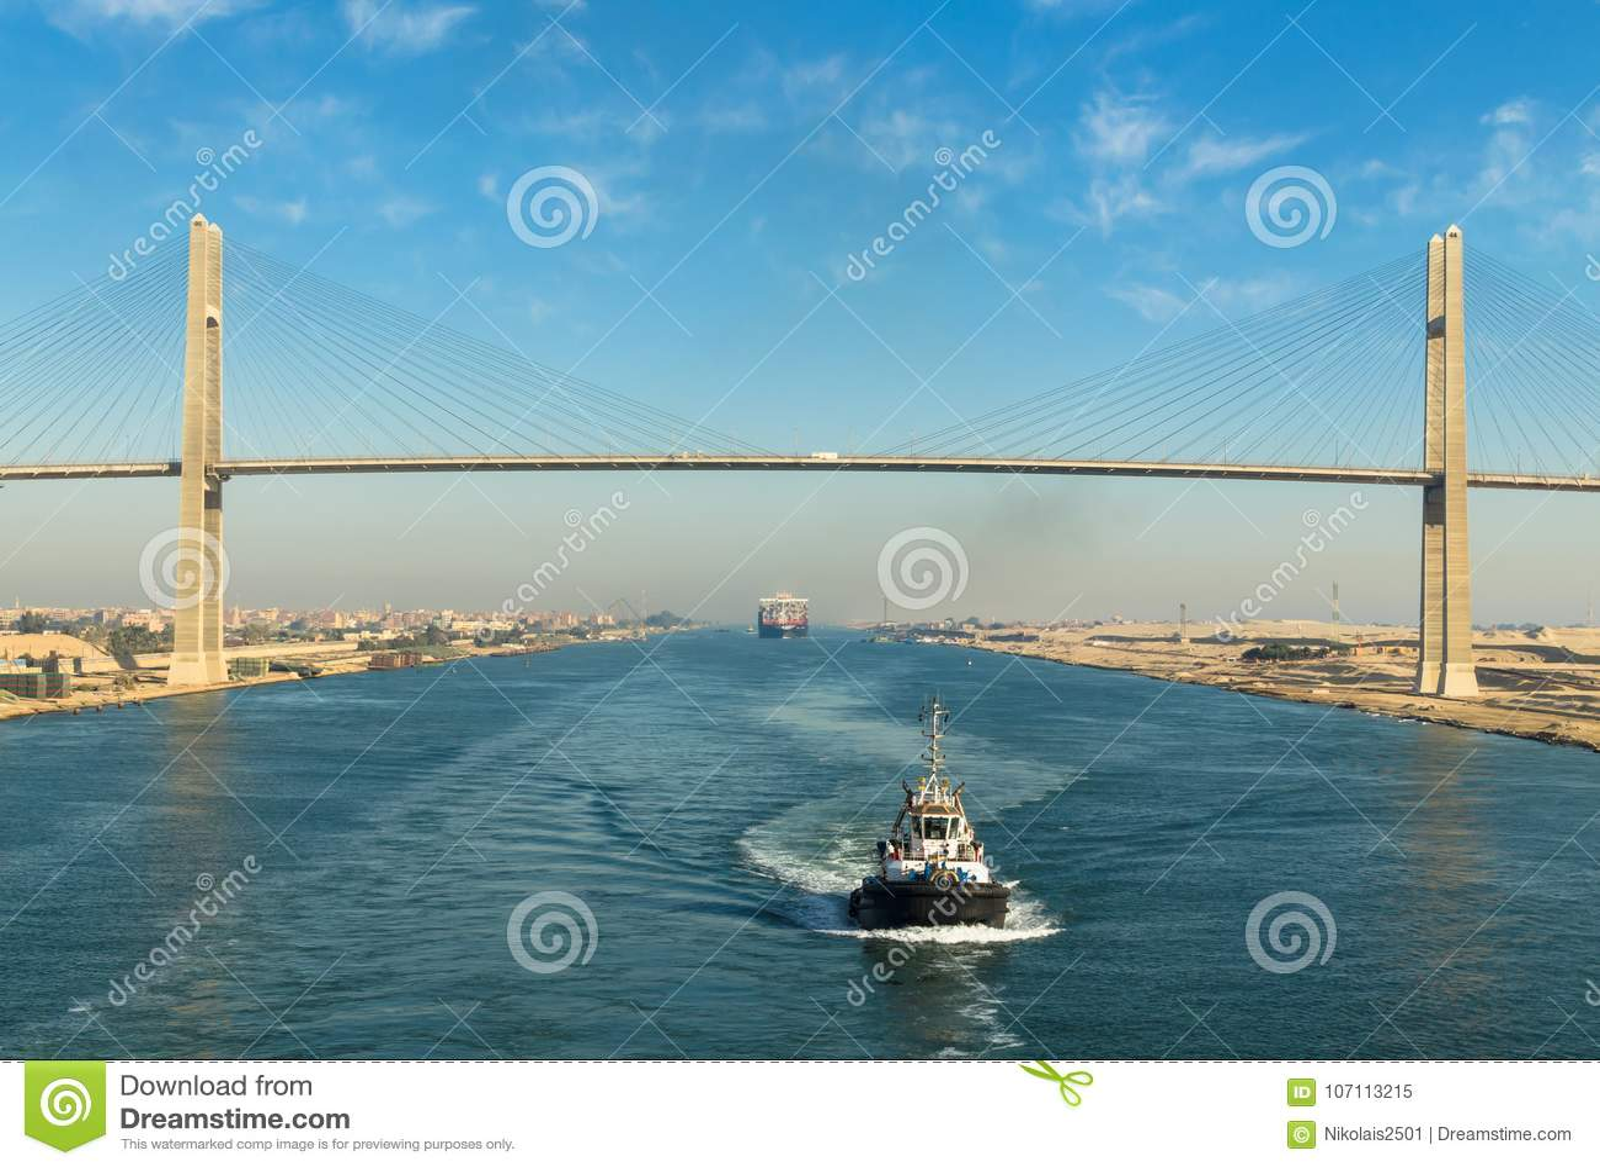 Канал Суэца, Египет, 2017: Грузите обоз ` s пропуская через канал Суэца, на заднем плане - мост канала Суэца